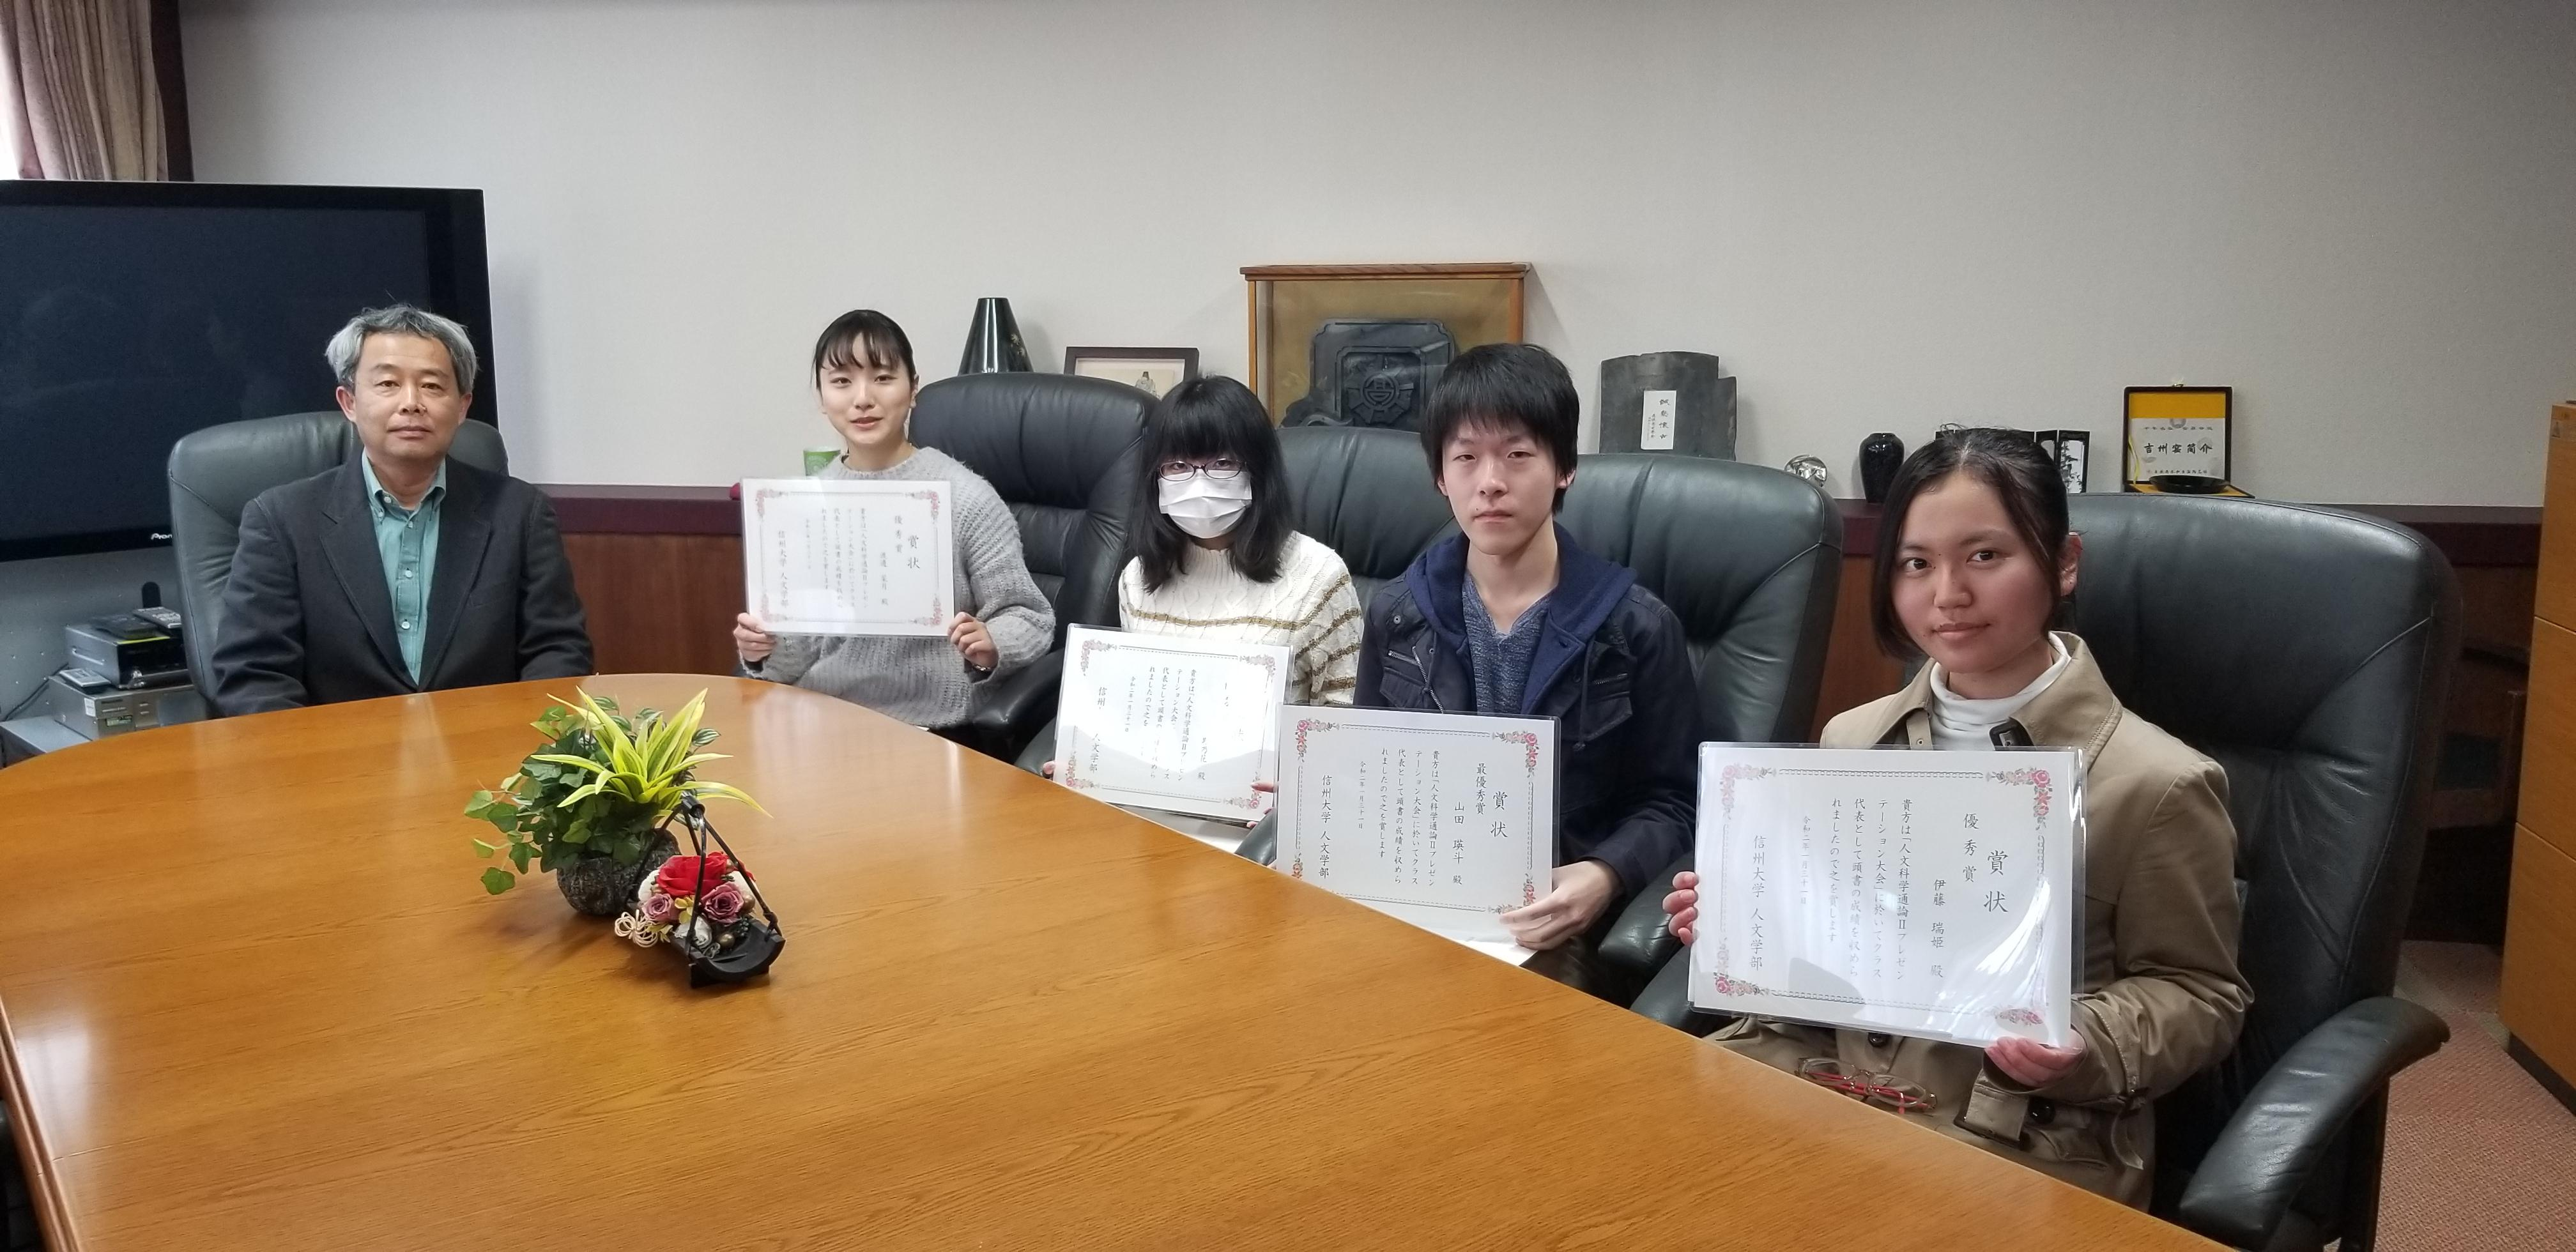 https://www.shinshu-u.ac.jp/faculty/arts/event/upload/20200131_122211.jpg